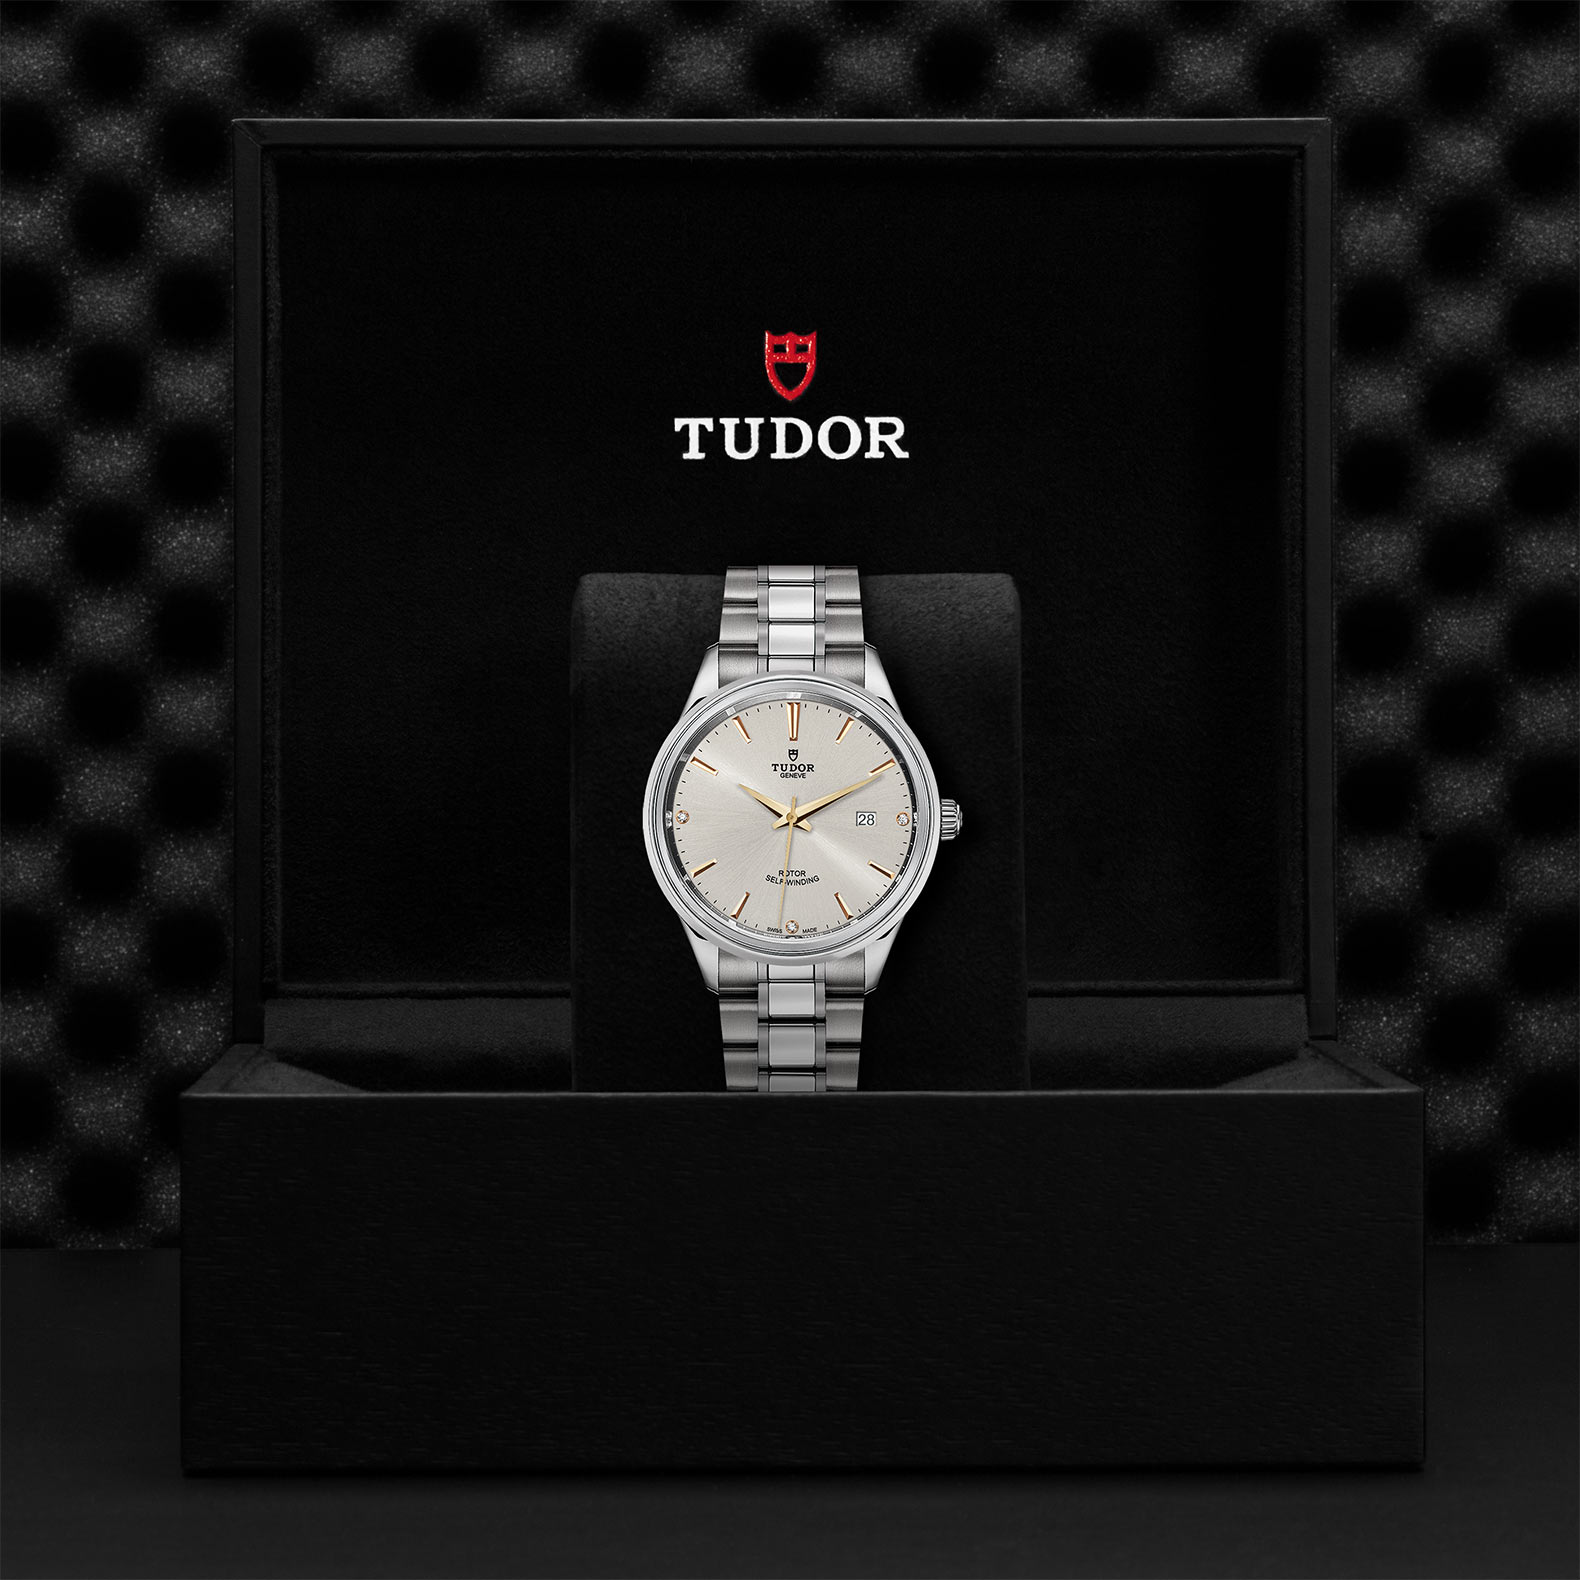 TUDOR Style M12700 0019 Presentationbox